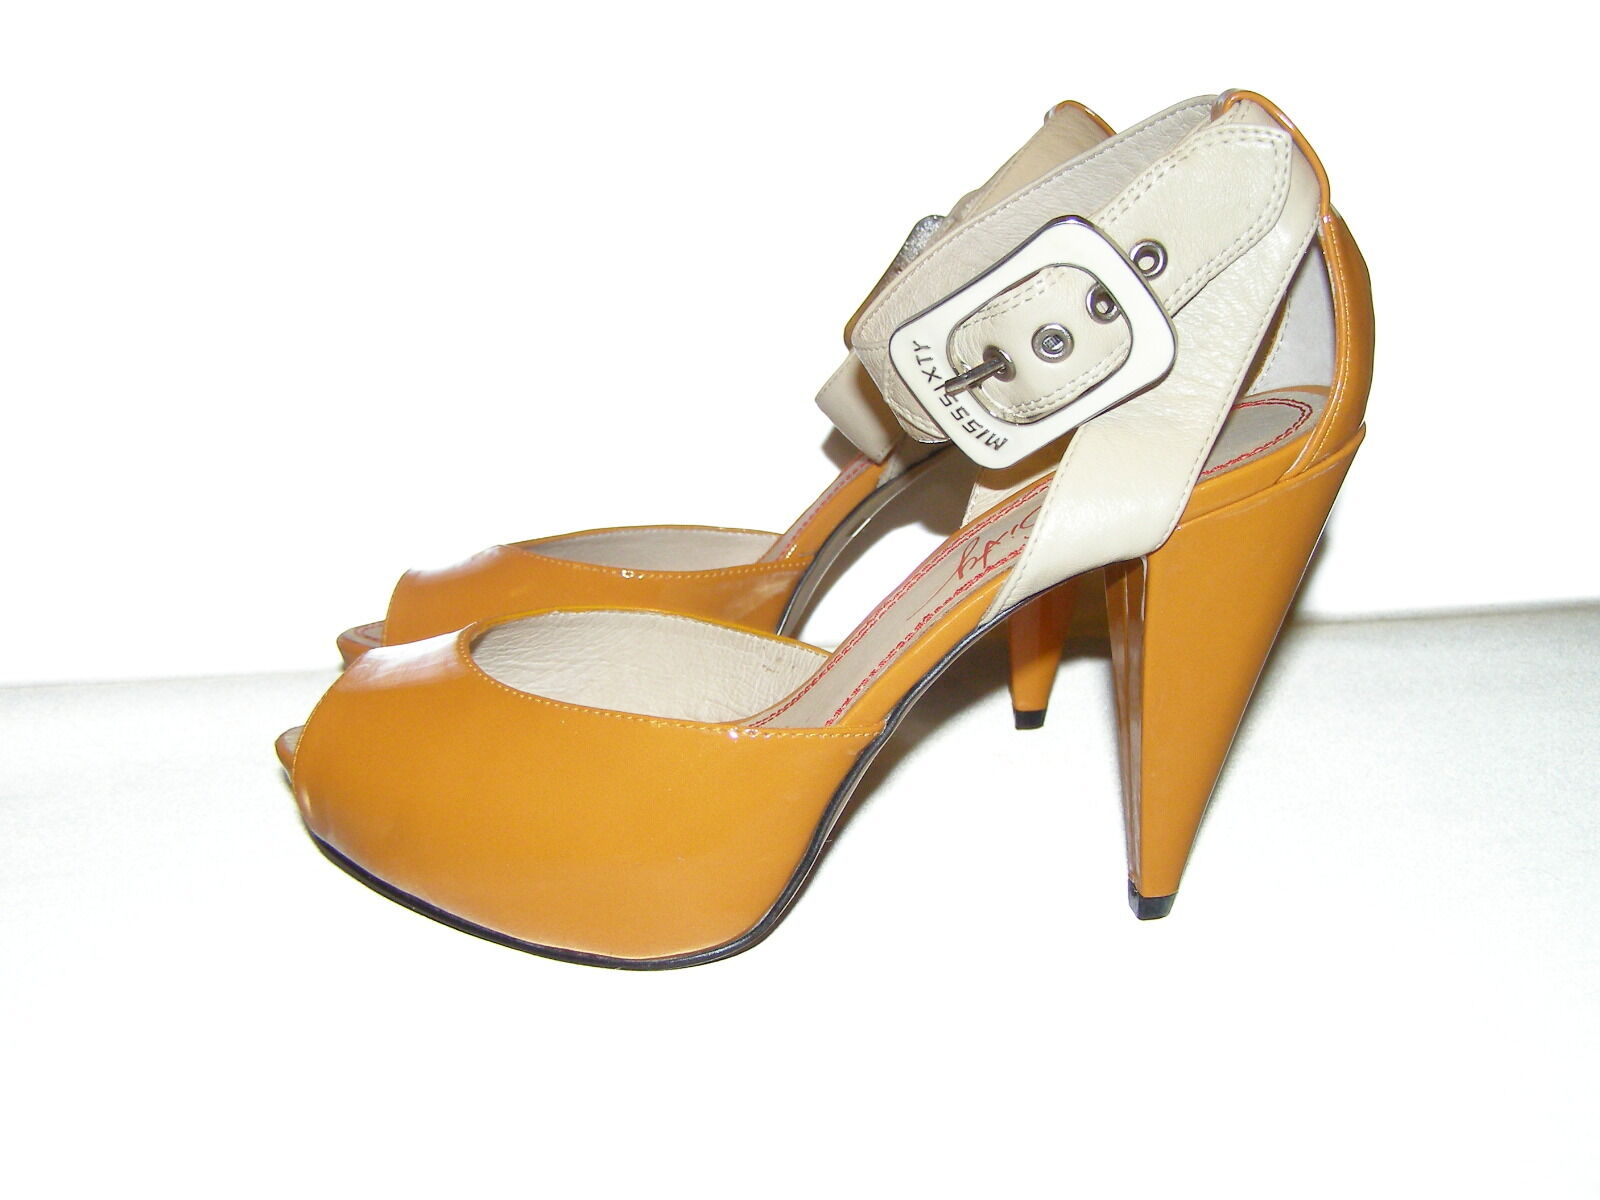 MISS SIXTY Casey patent high heel ankle strap patent Casey Orange Sandal New 8 39 b3ce42